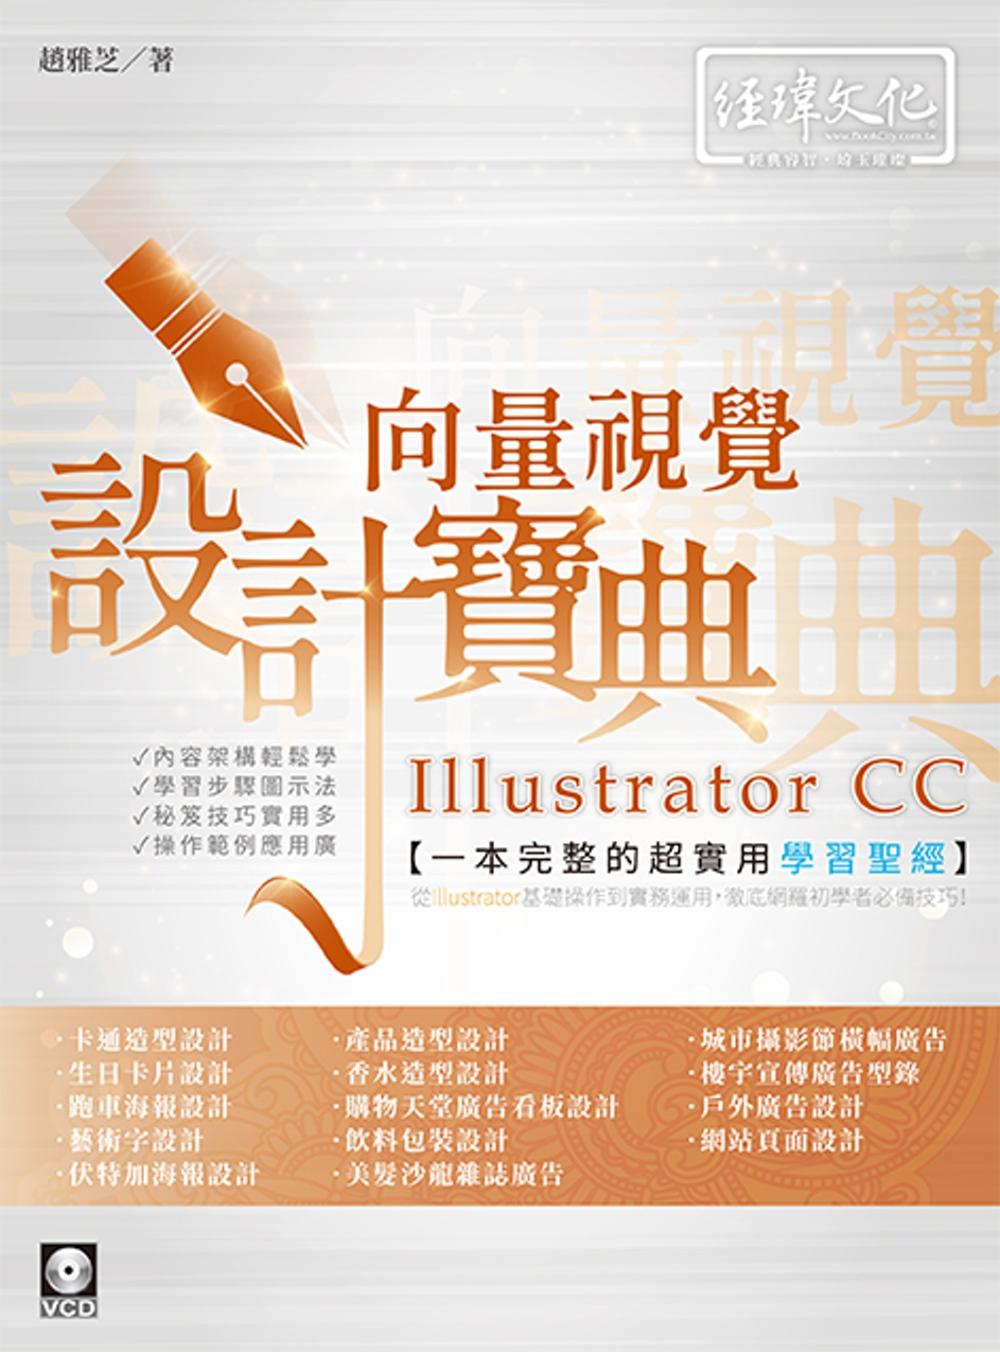 Illustrator CC ...